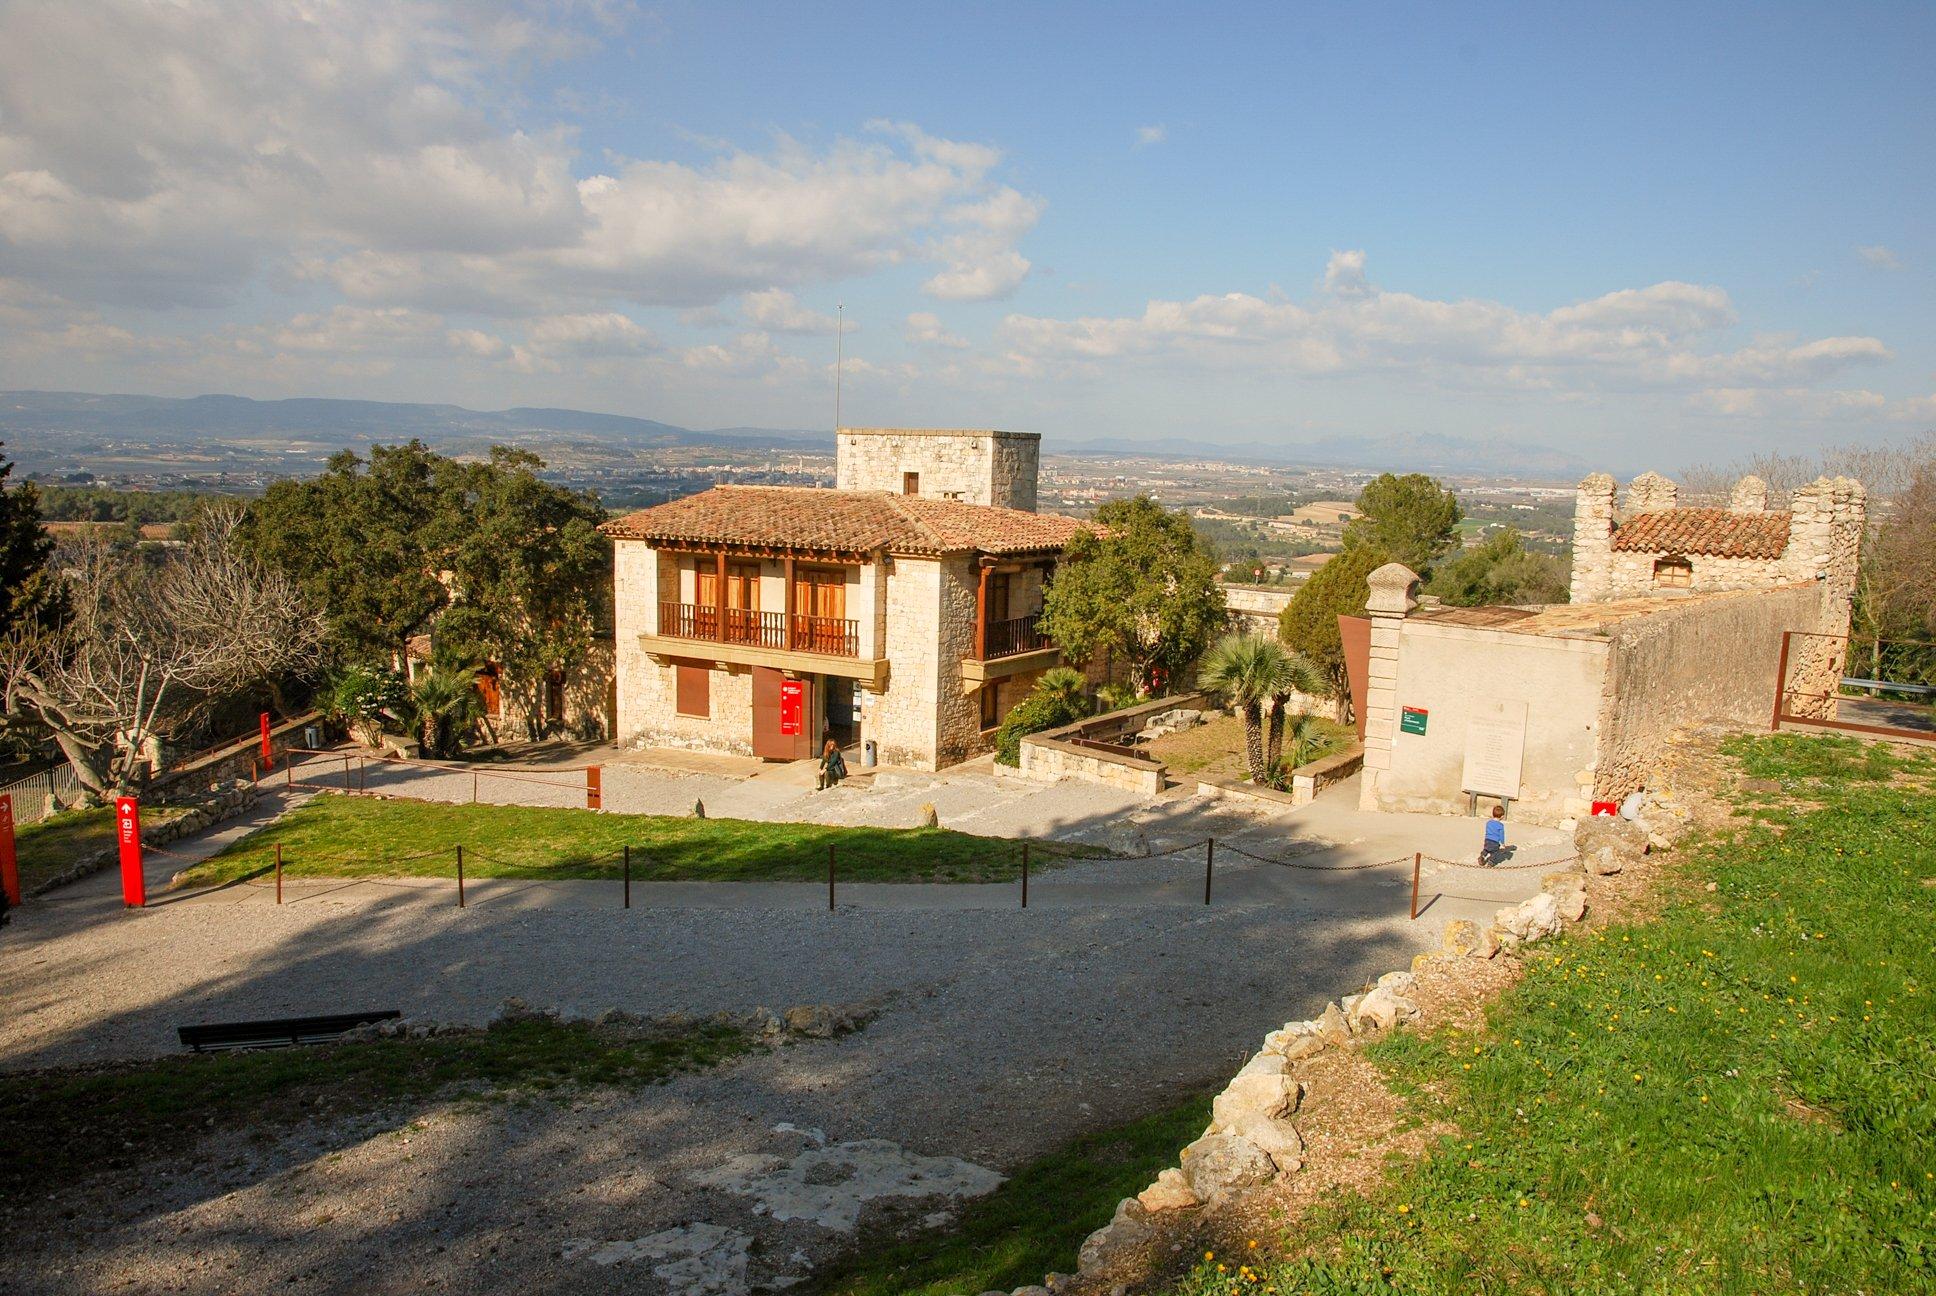 Olèrdola museum, built in refurbished old masia / rectory overlooking the Penedès wine region and Montserrat, Olèrdola monumental complex